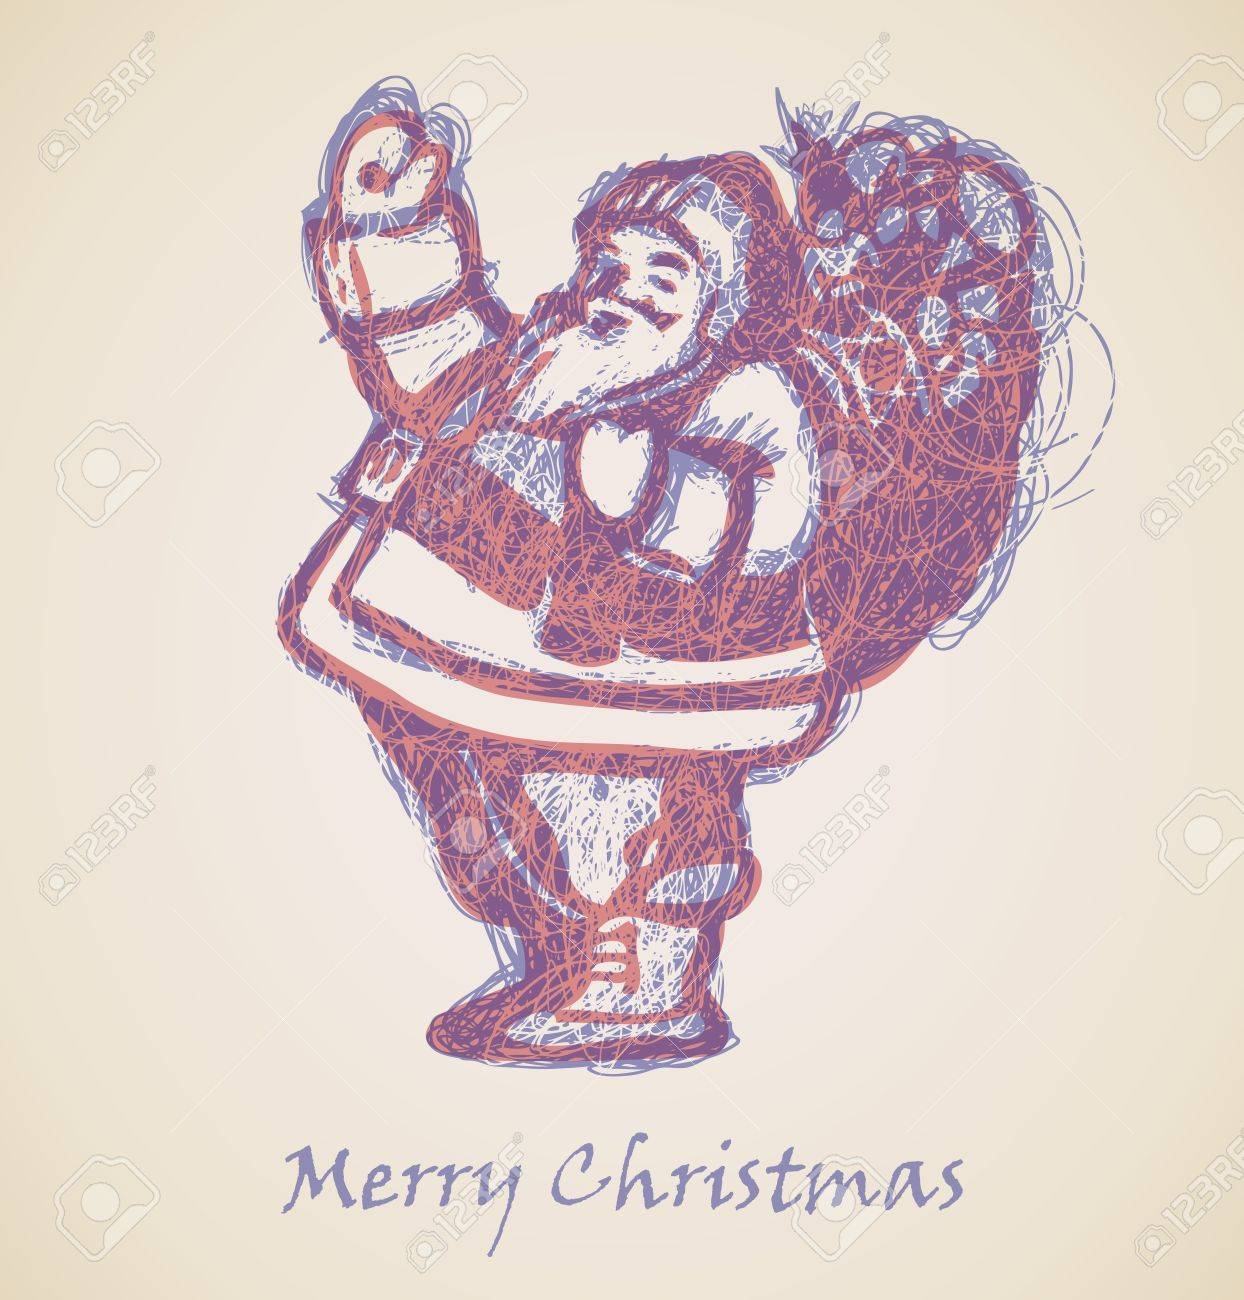 Santa Claus Sketch, Christmas design element Stock Vector - 15339567